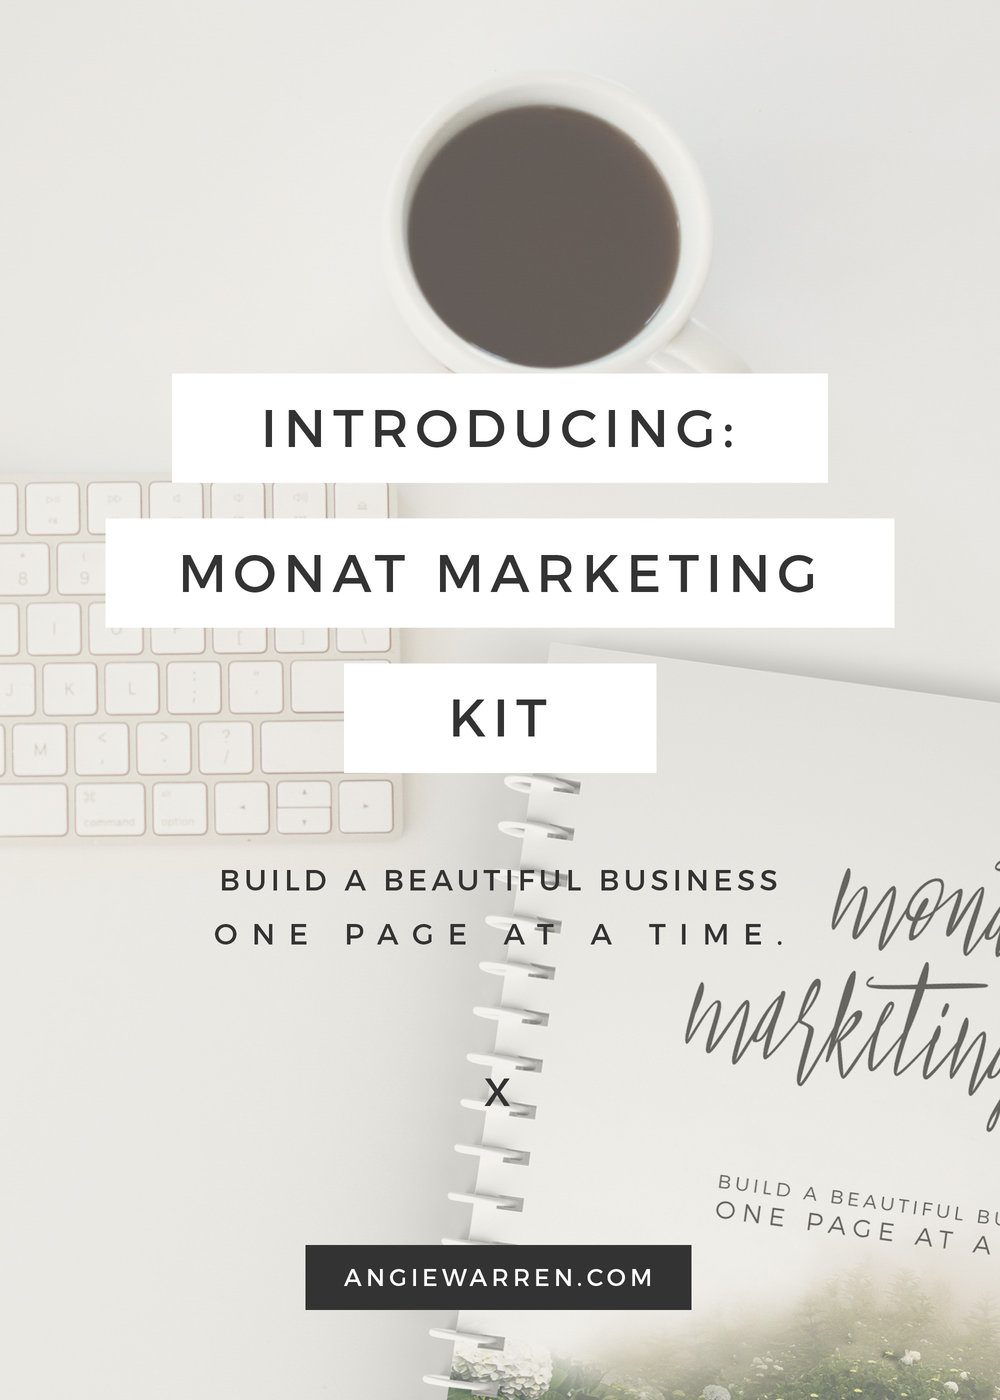 MONAT Marketing Kit / Business Planner / www.angiewarren.com